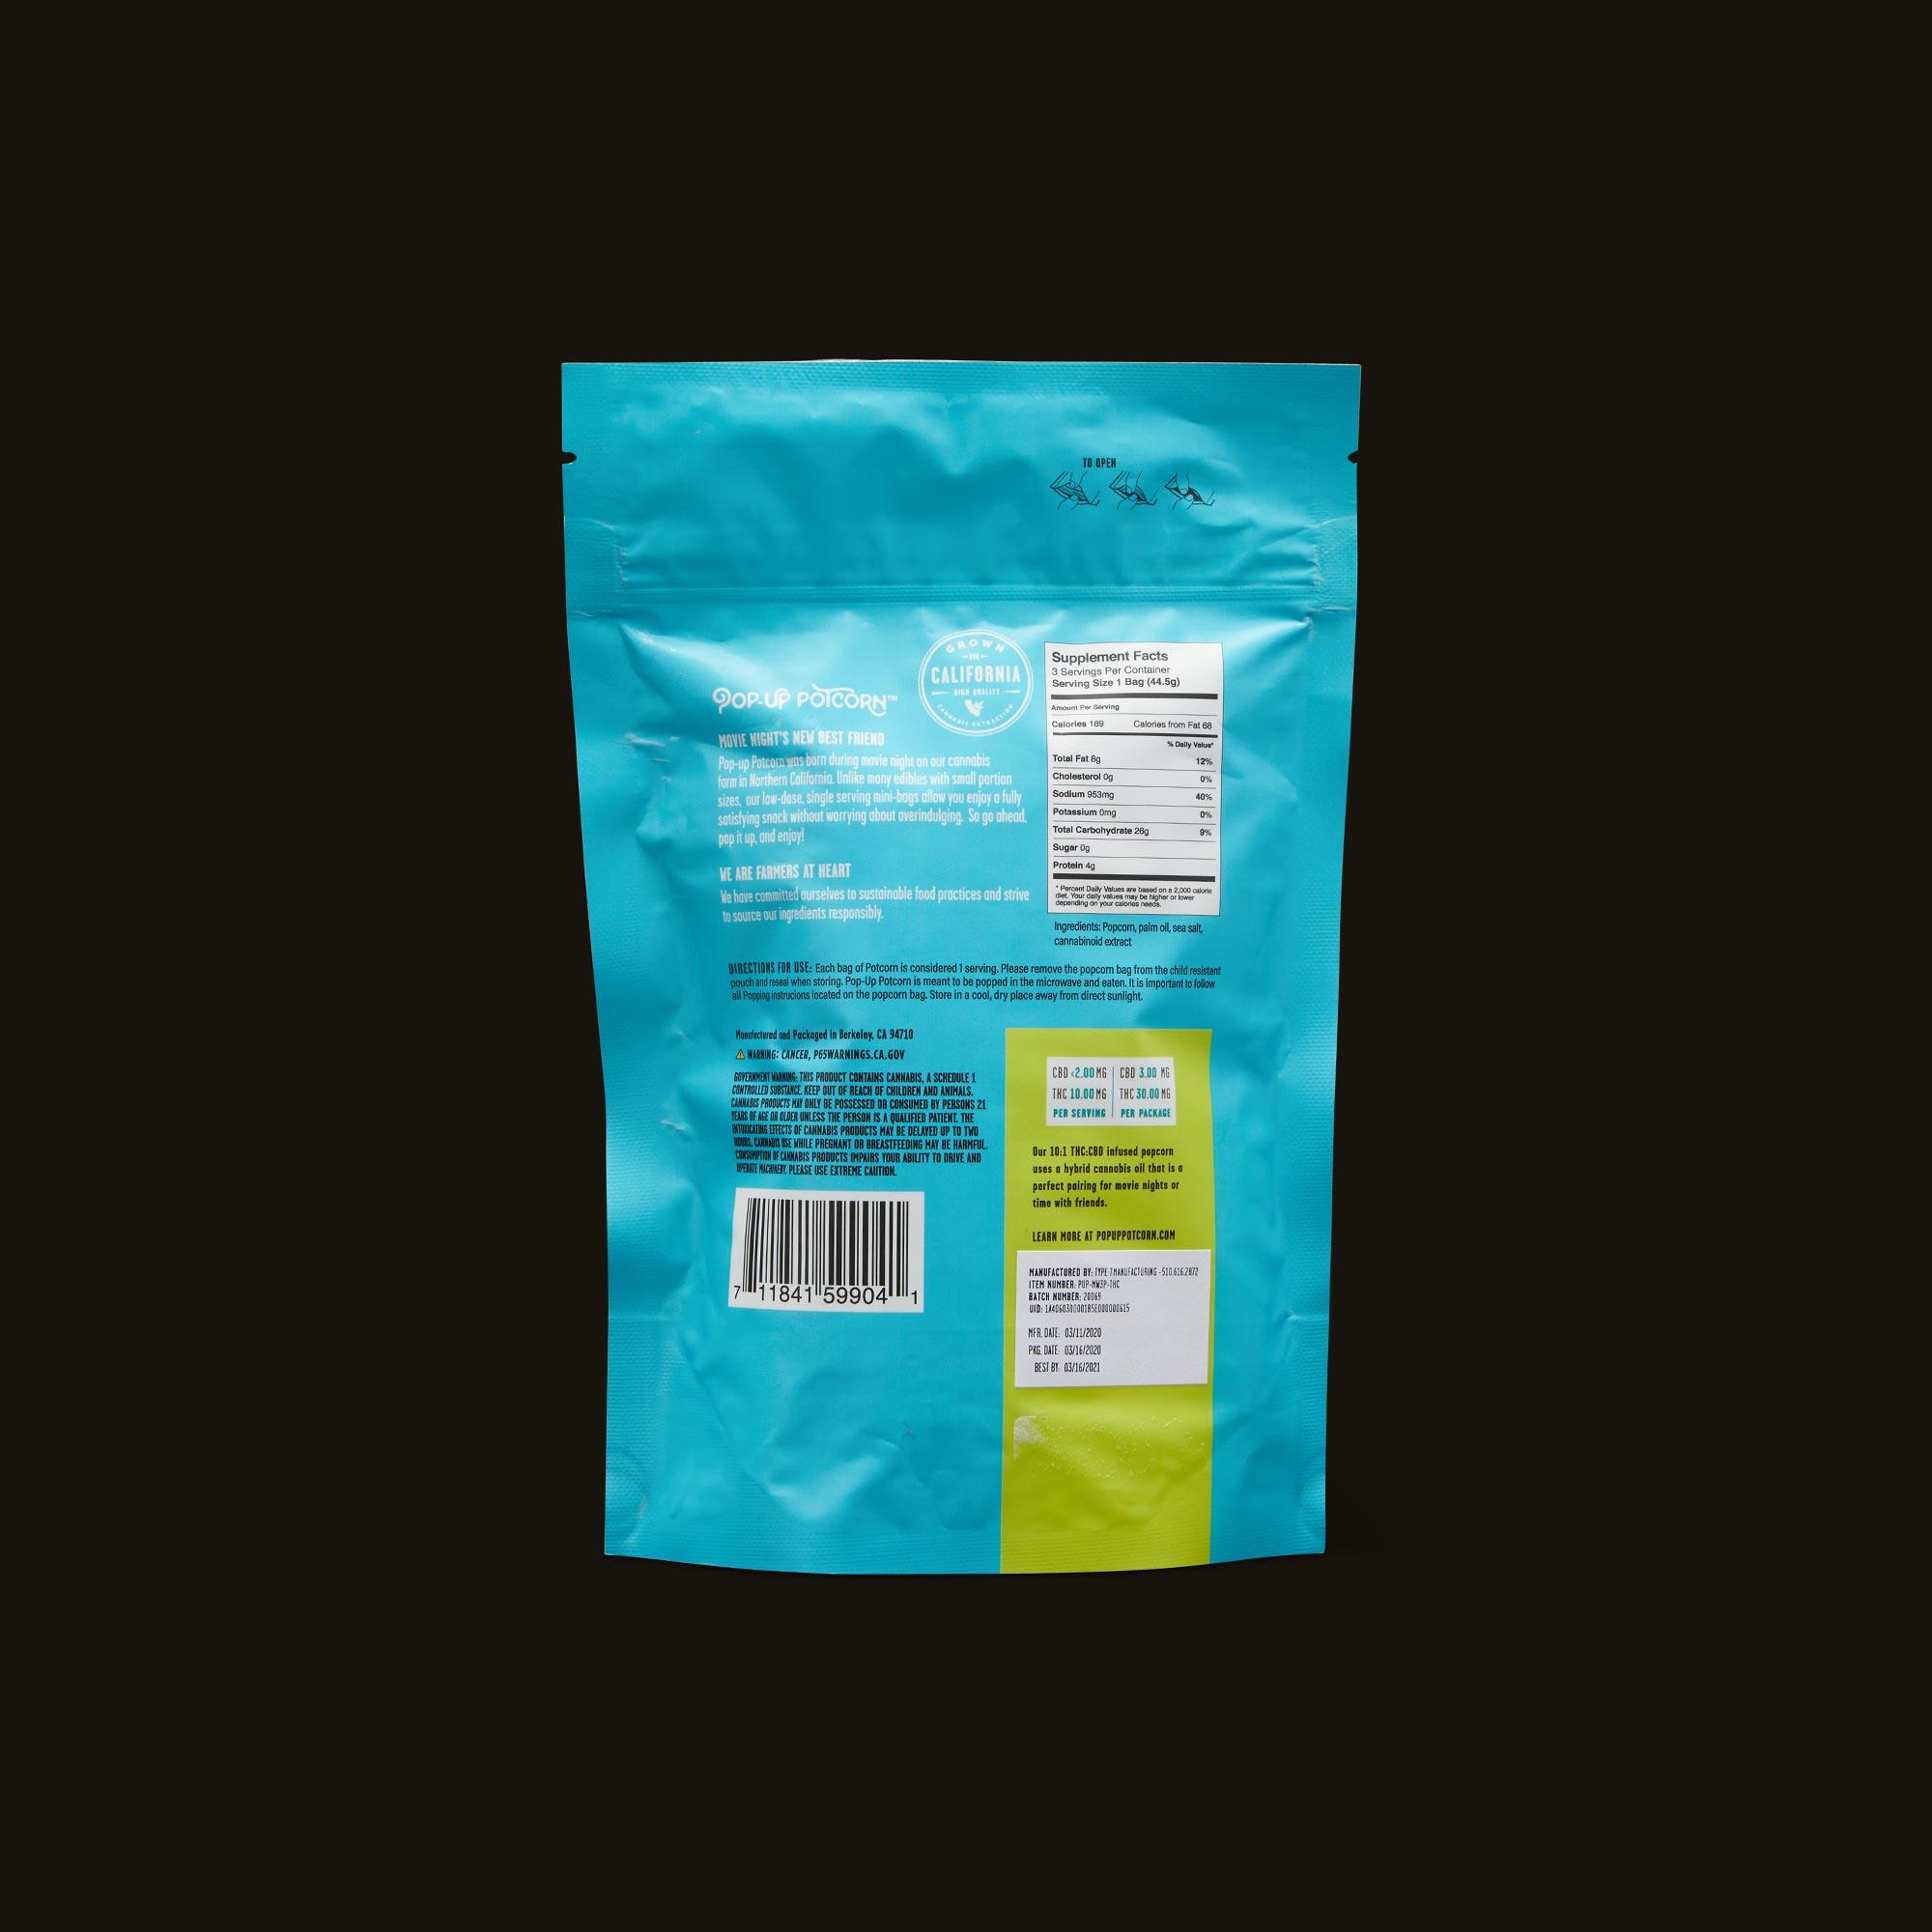 Pop-Up Potcorn Sea Salt Popcorn 10:1 3-Pack Ingredients